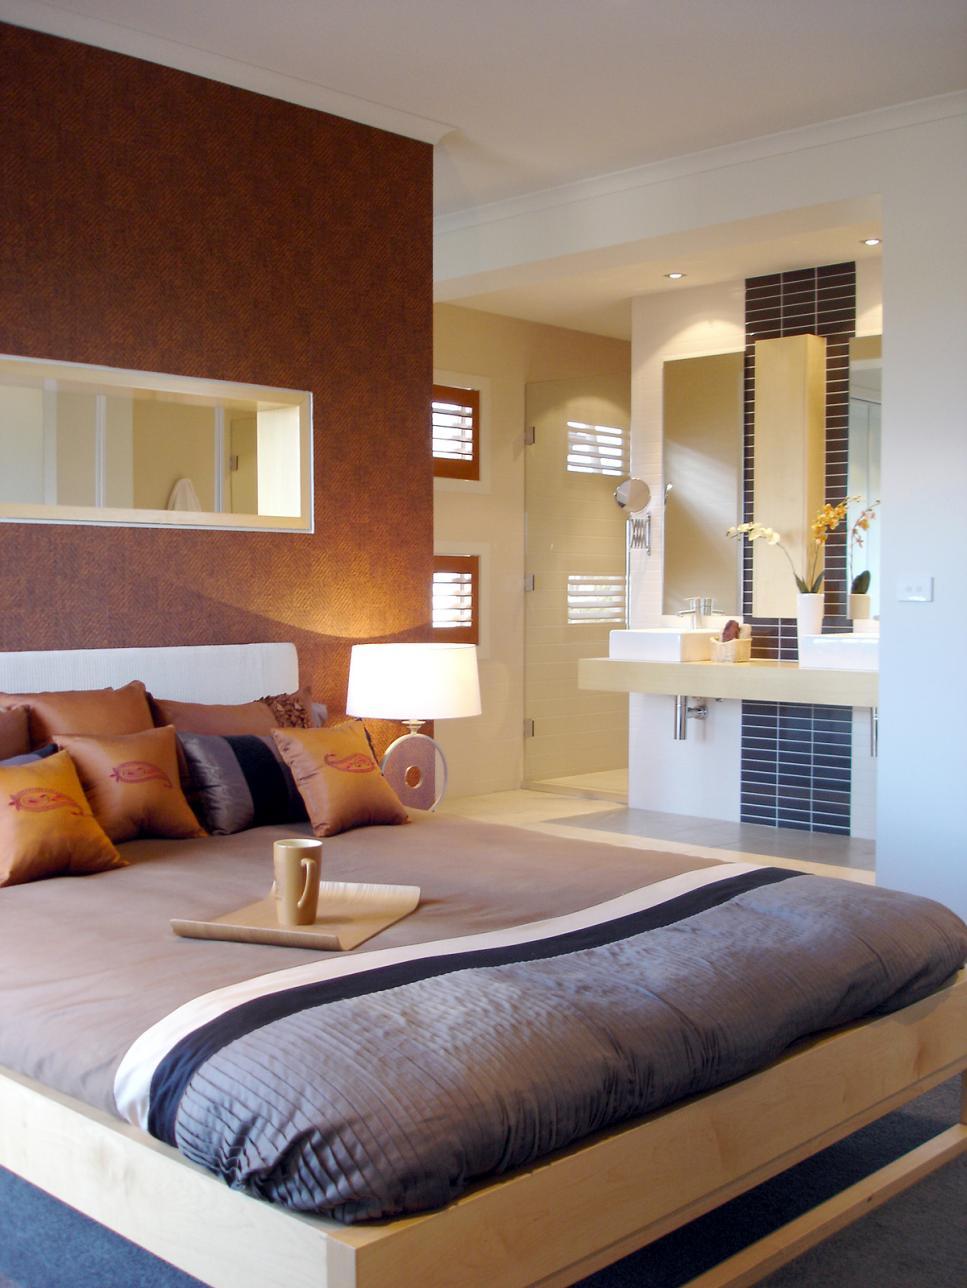 Bedroom With Bathroom: 12 Cozy Guest Bedroom Retreats